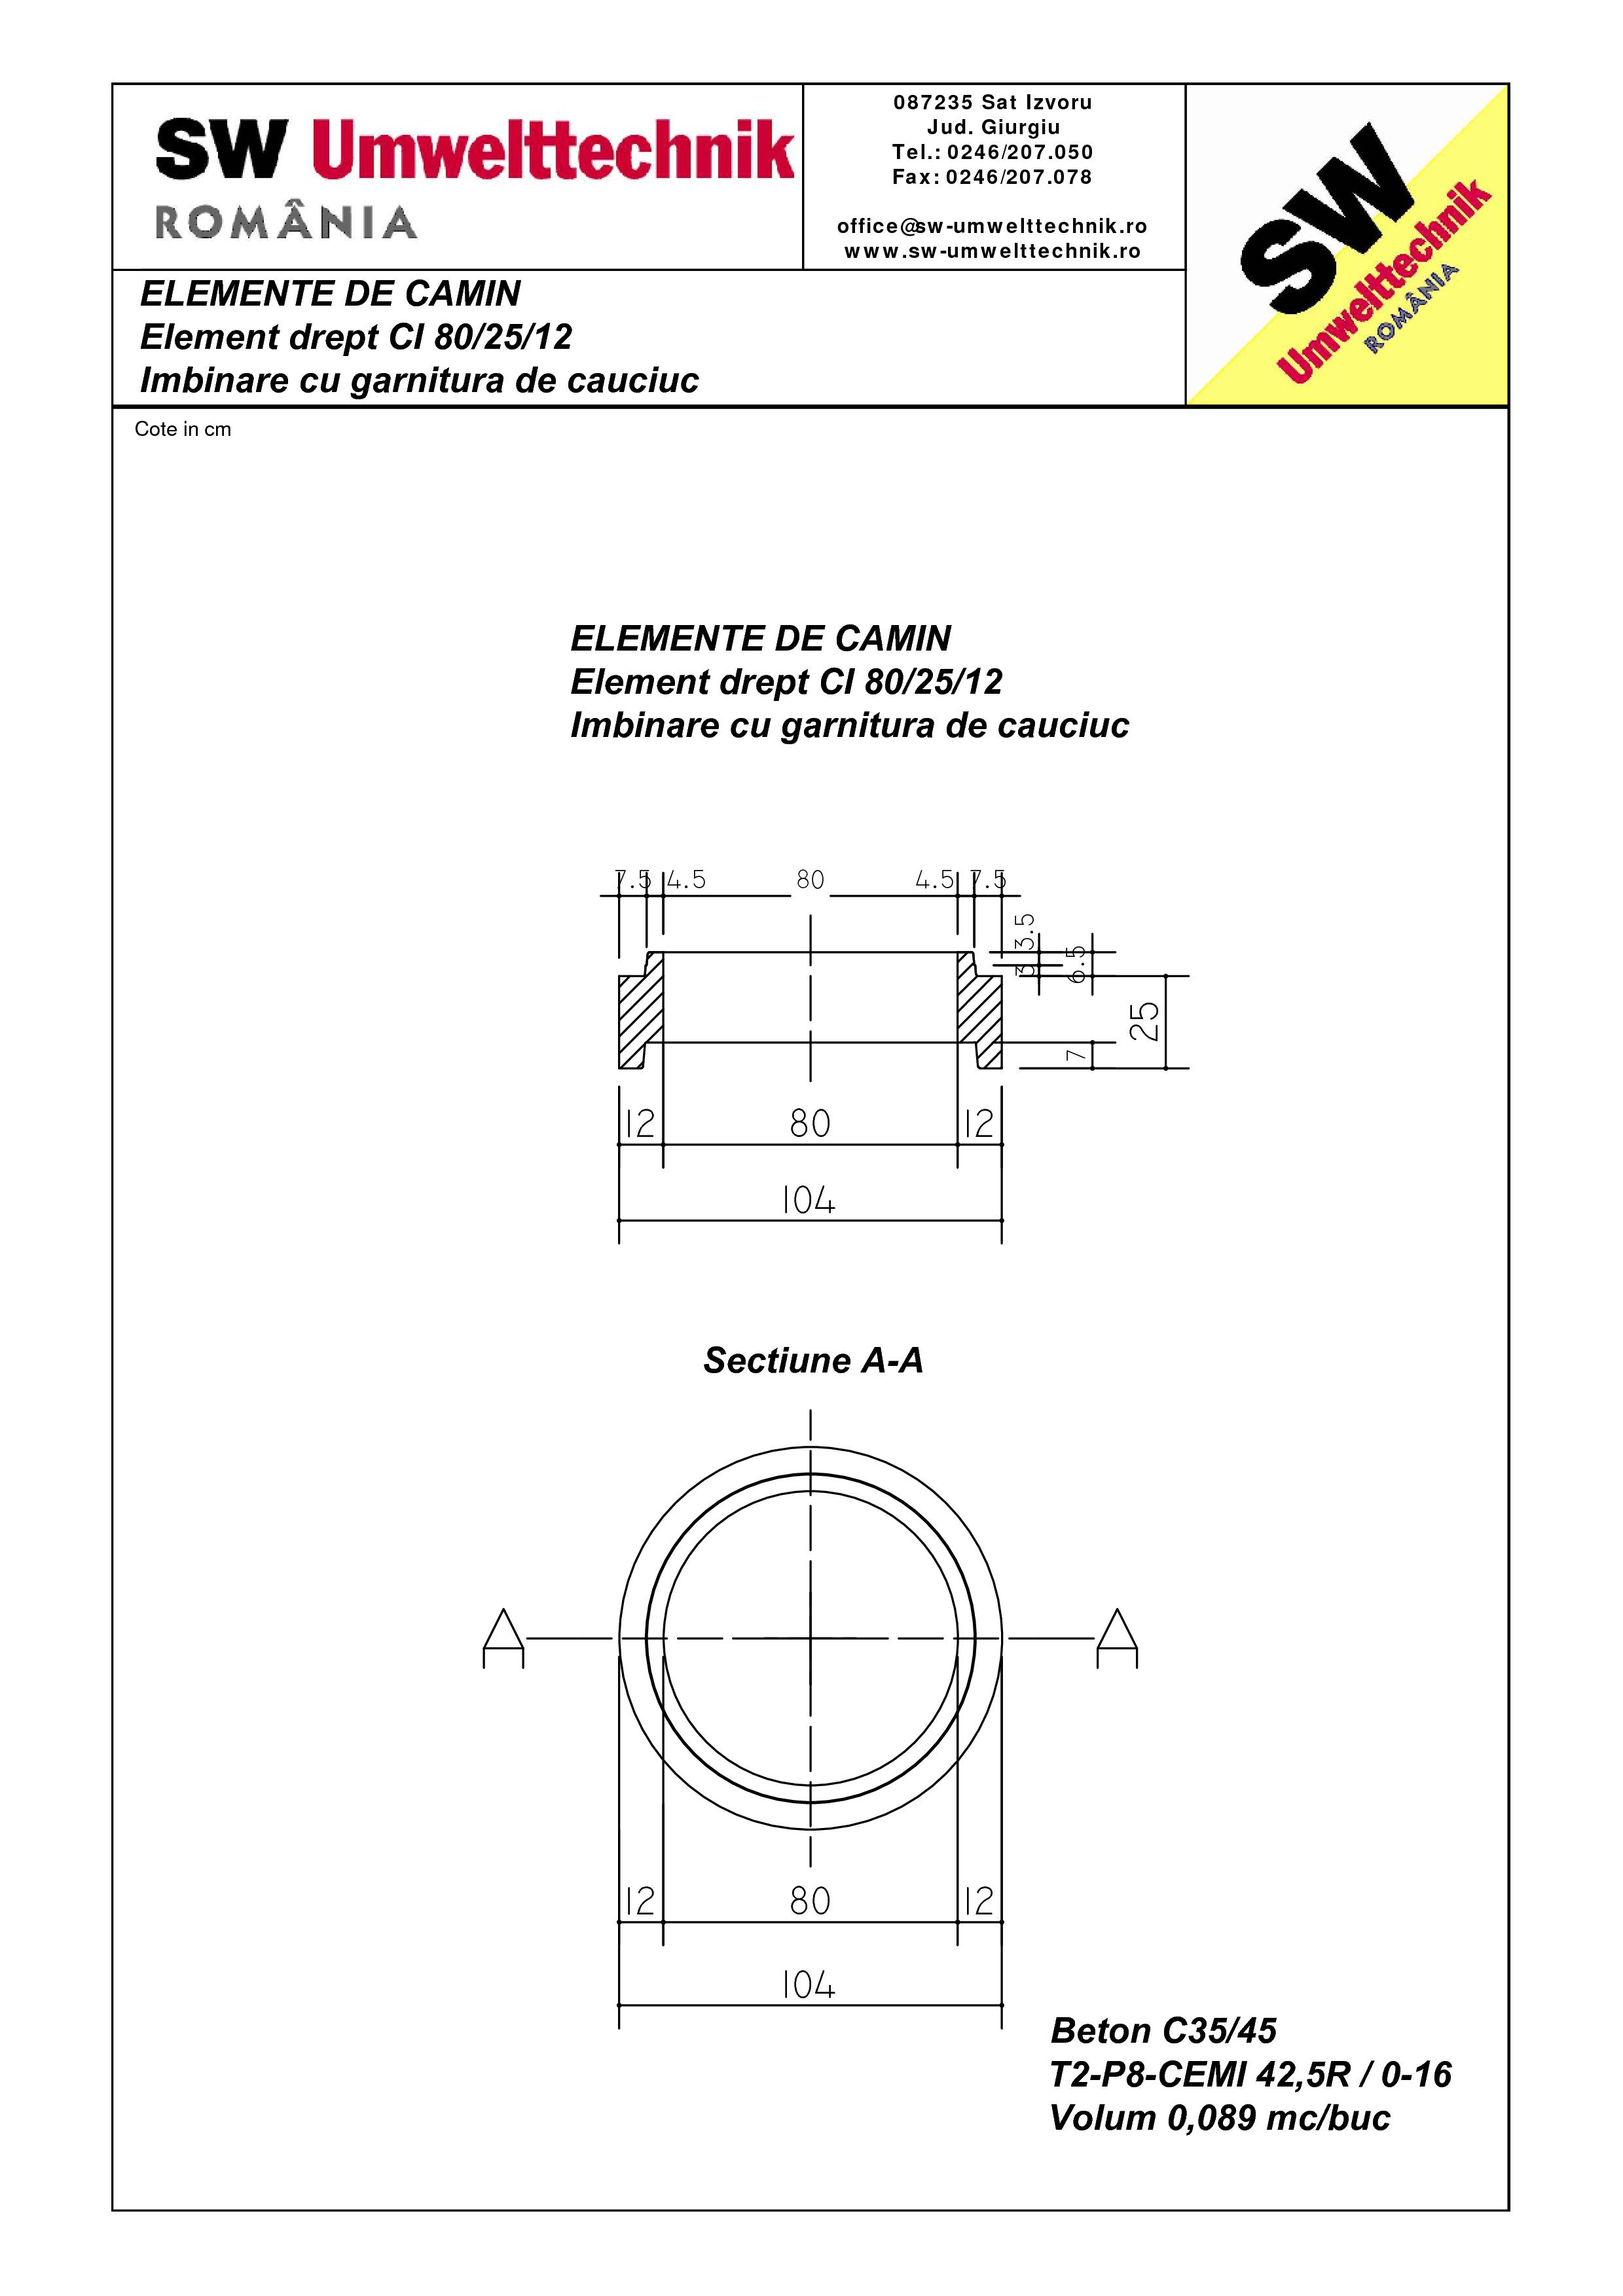 Pagina 1 - CAD-PDF Element drept - inel CI 80.25.12 SW UMWELTTECHNIK Detaliu de produs